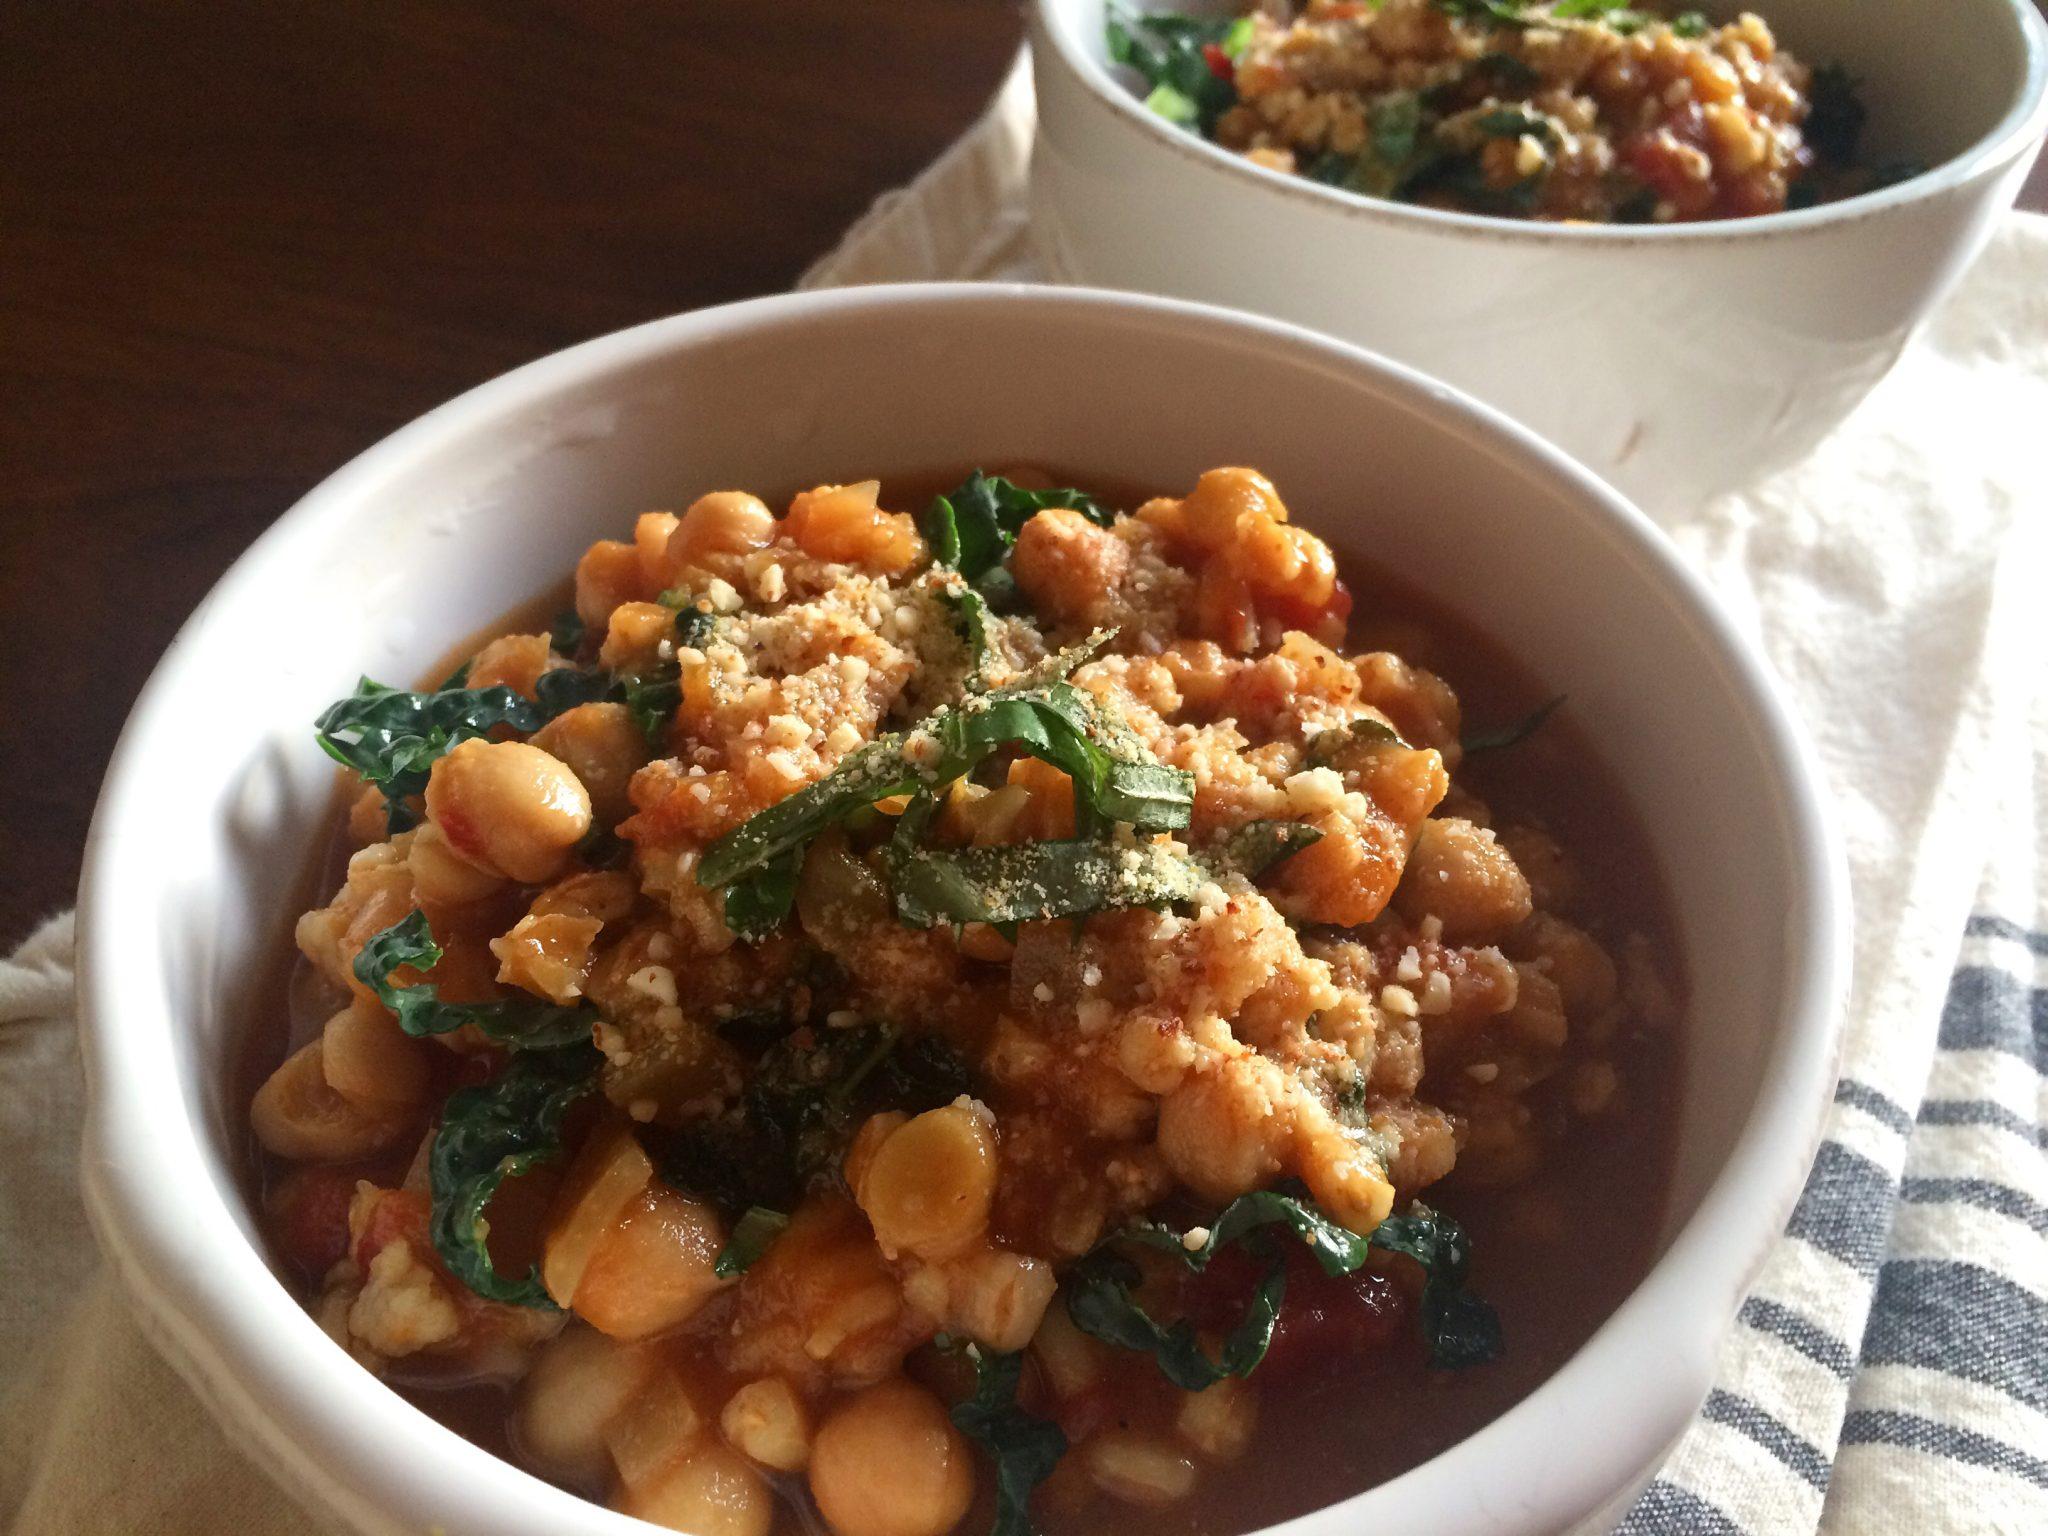 Italian Tomato & Kale Farro Soup